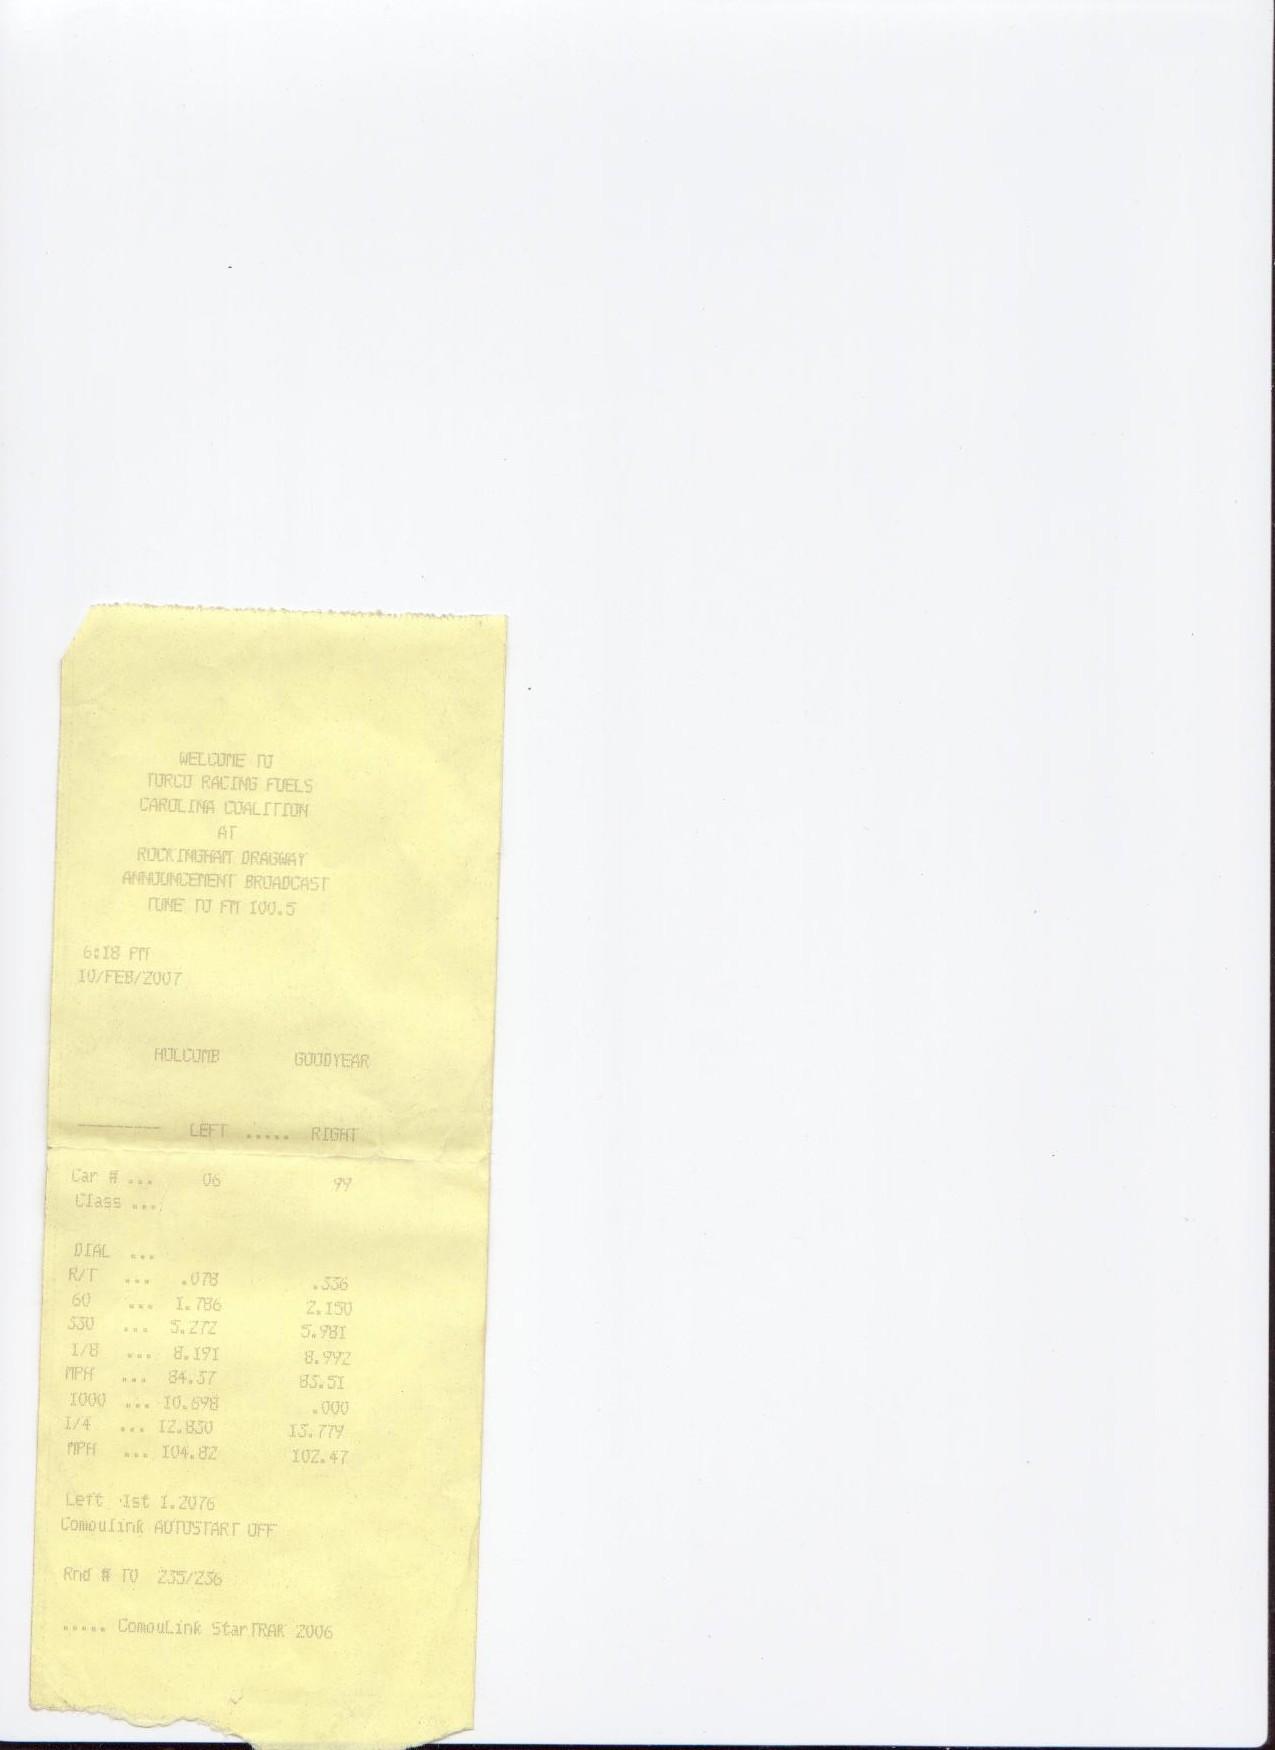 Dodge Neon SRT-4 Timeslip Scan